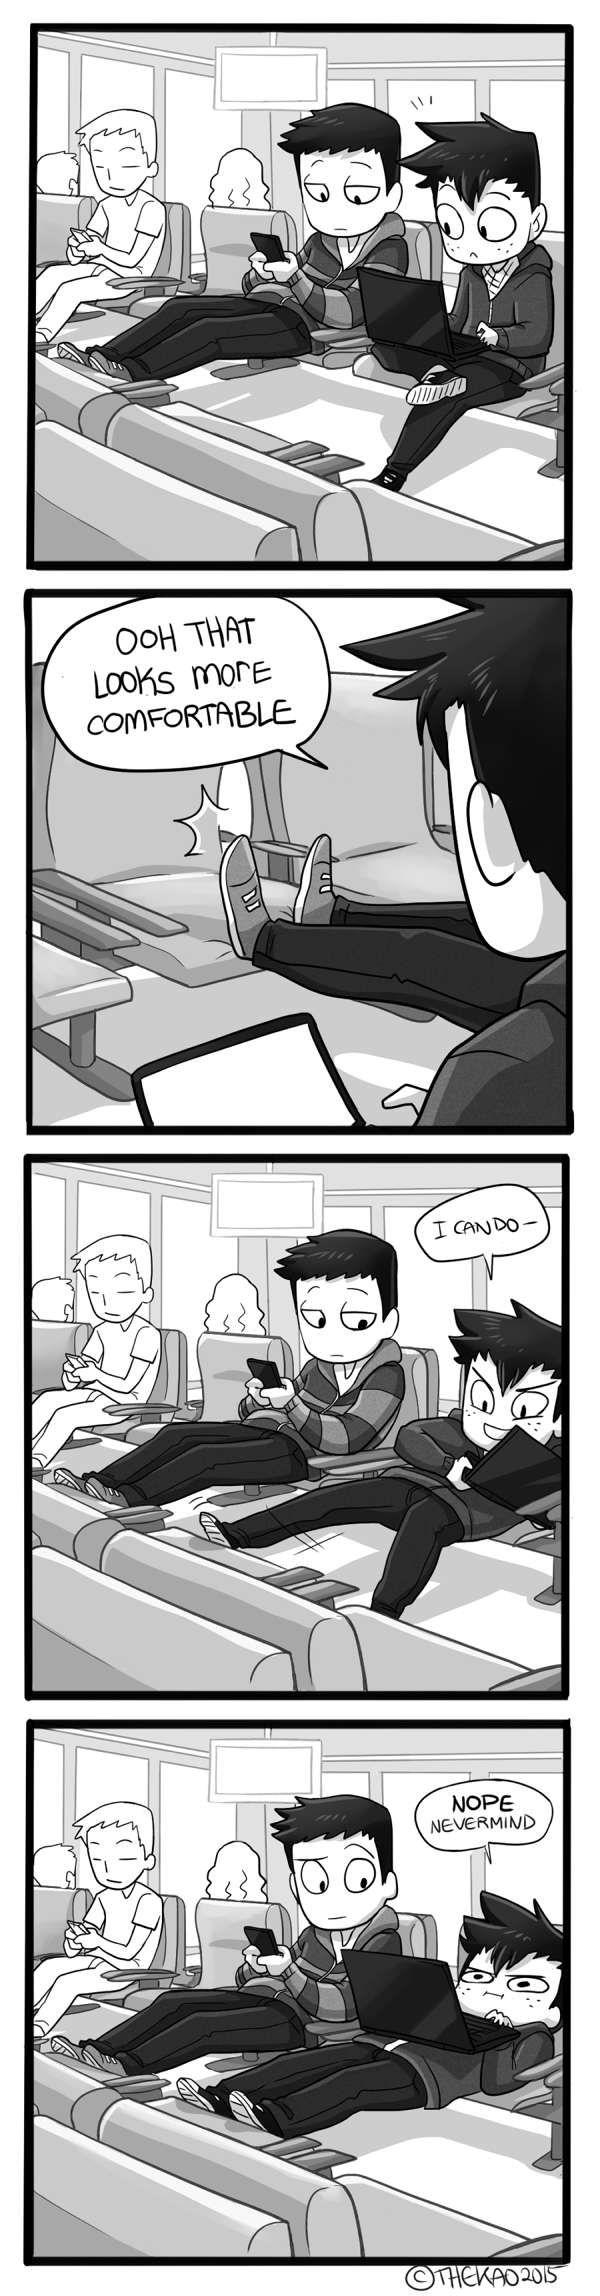 Happens to me too often... From: Mondo Mango :: Short Legs   Tapastic Comics - image 1